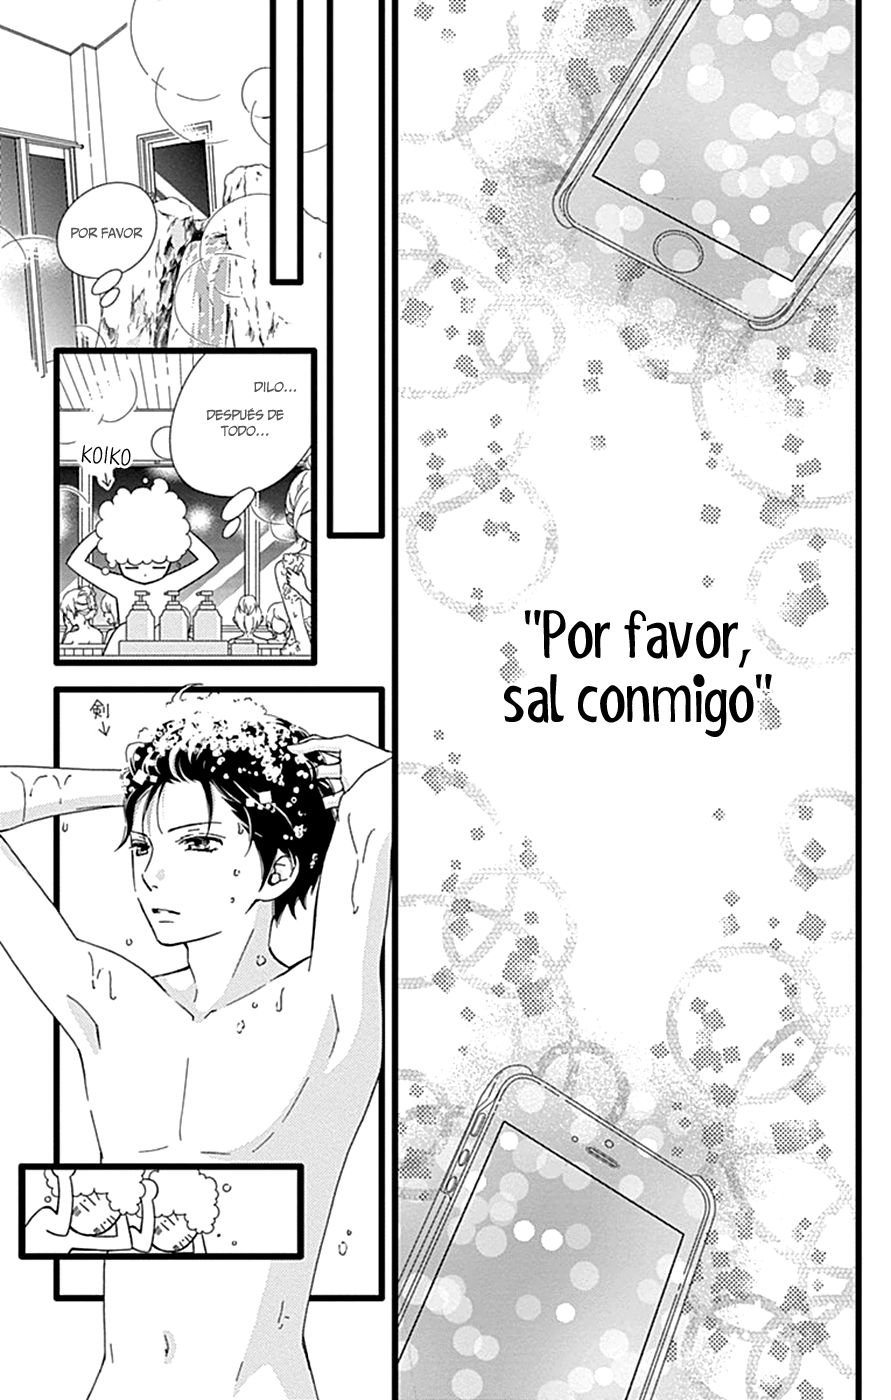 Futsuu no Koiko-chan Chapter 22 - YoLoManga.com